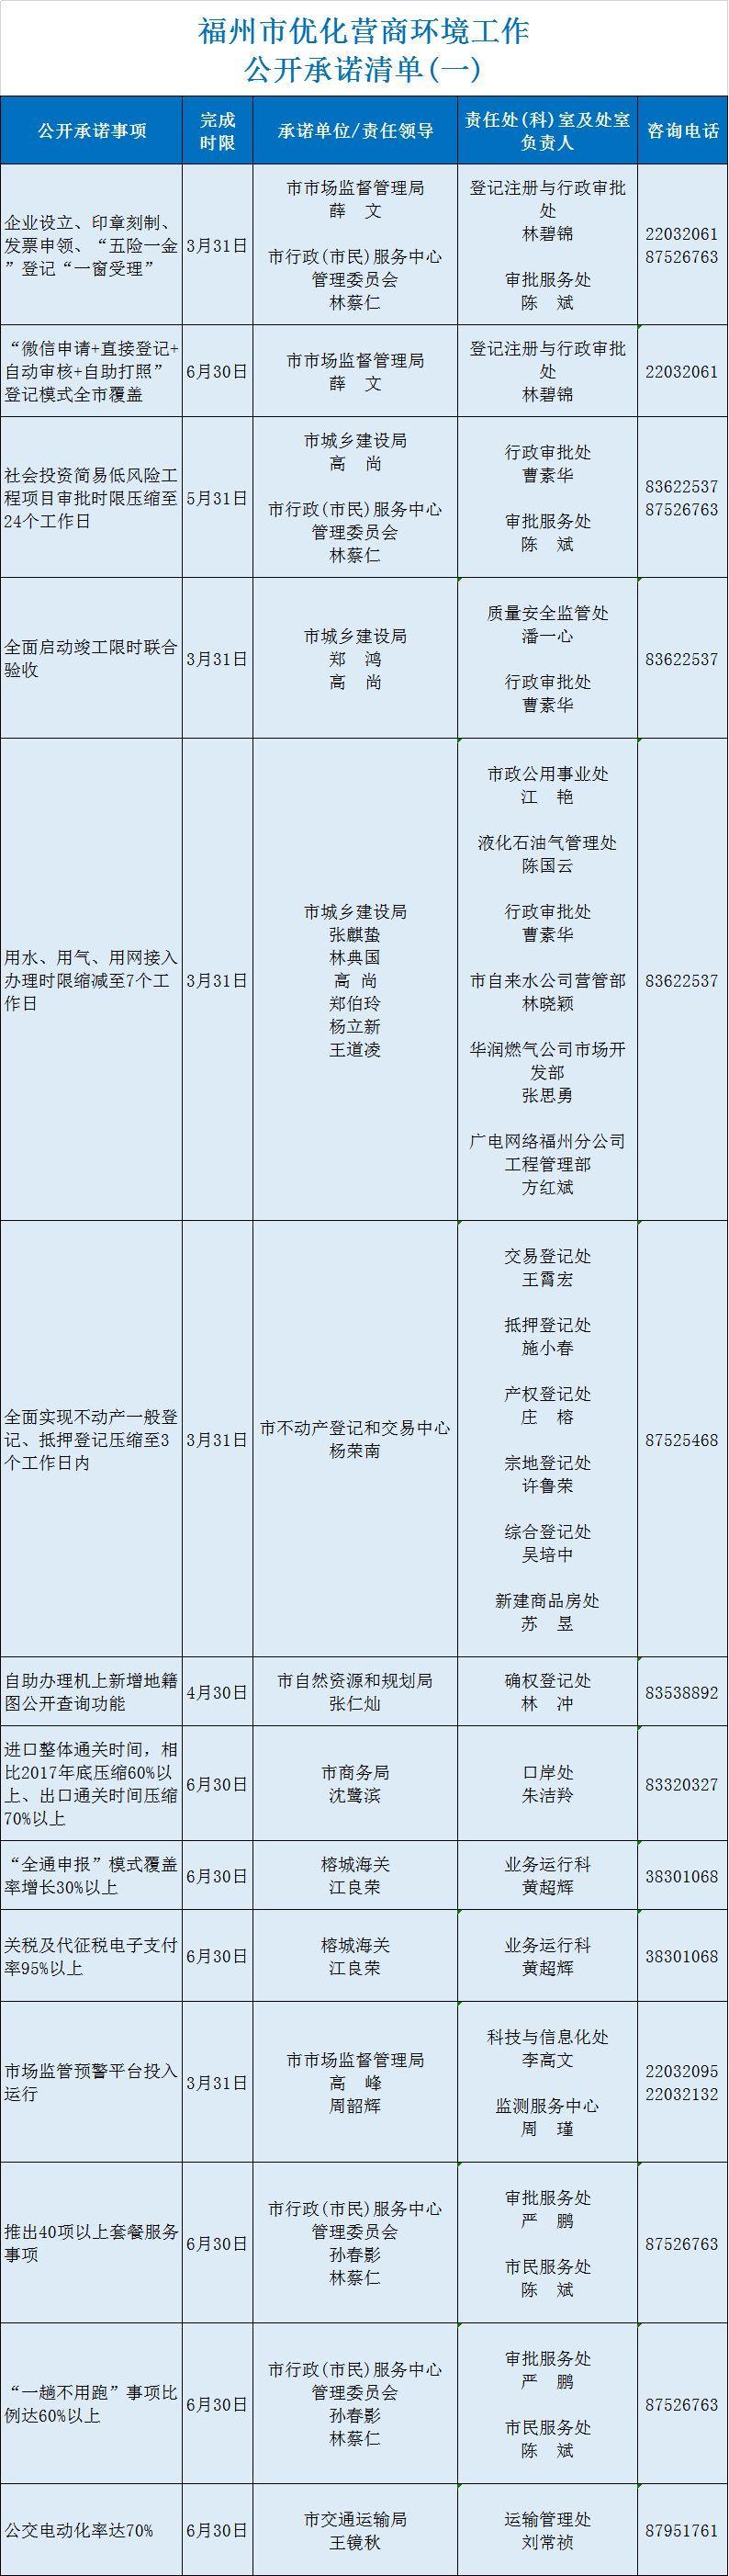 http://www.clzxc.com/changlejingji/18617.html